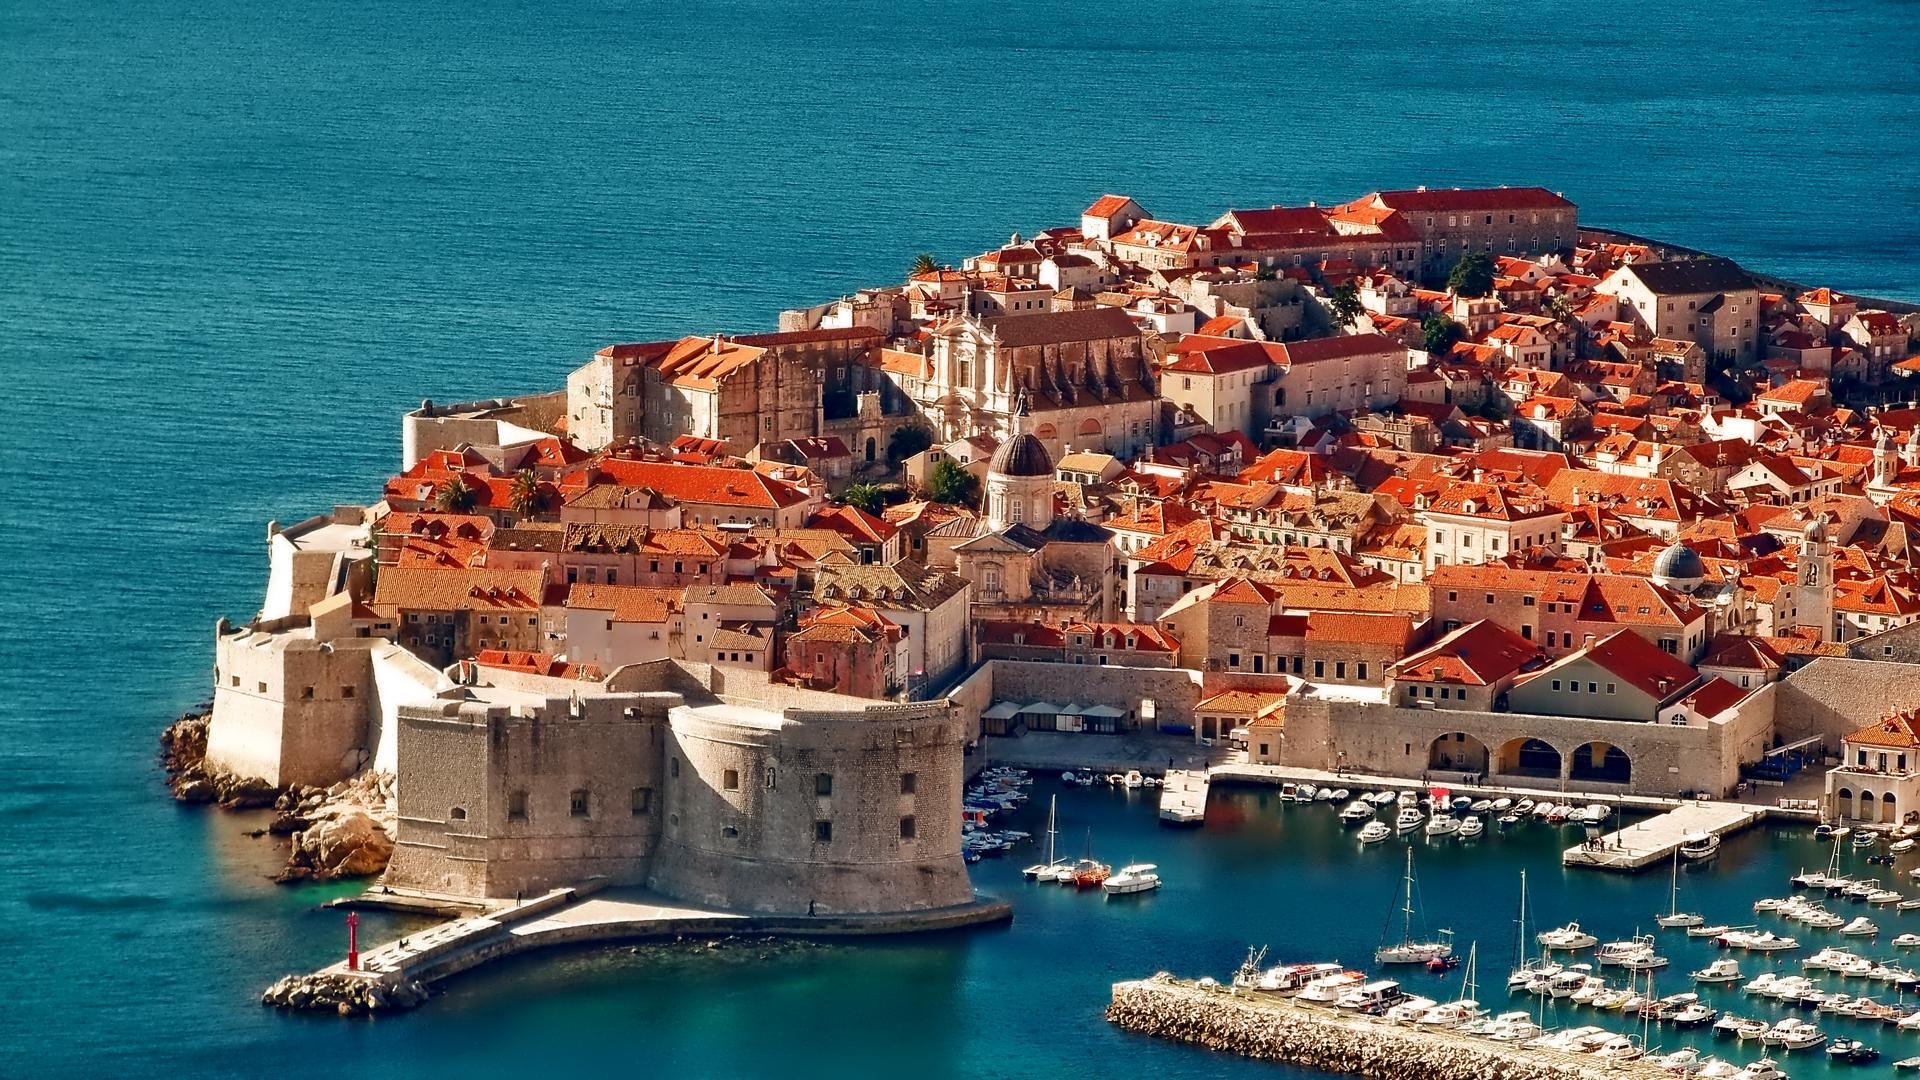 CROATIA3 - Dubrovnik